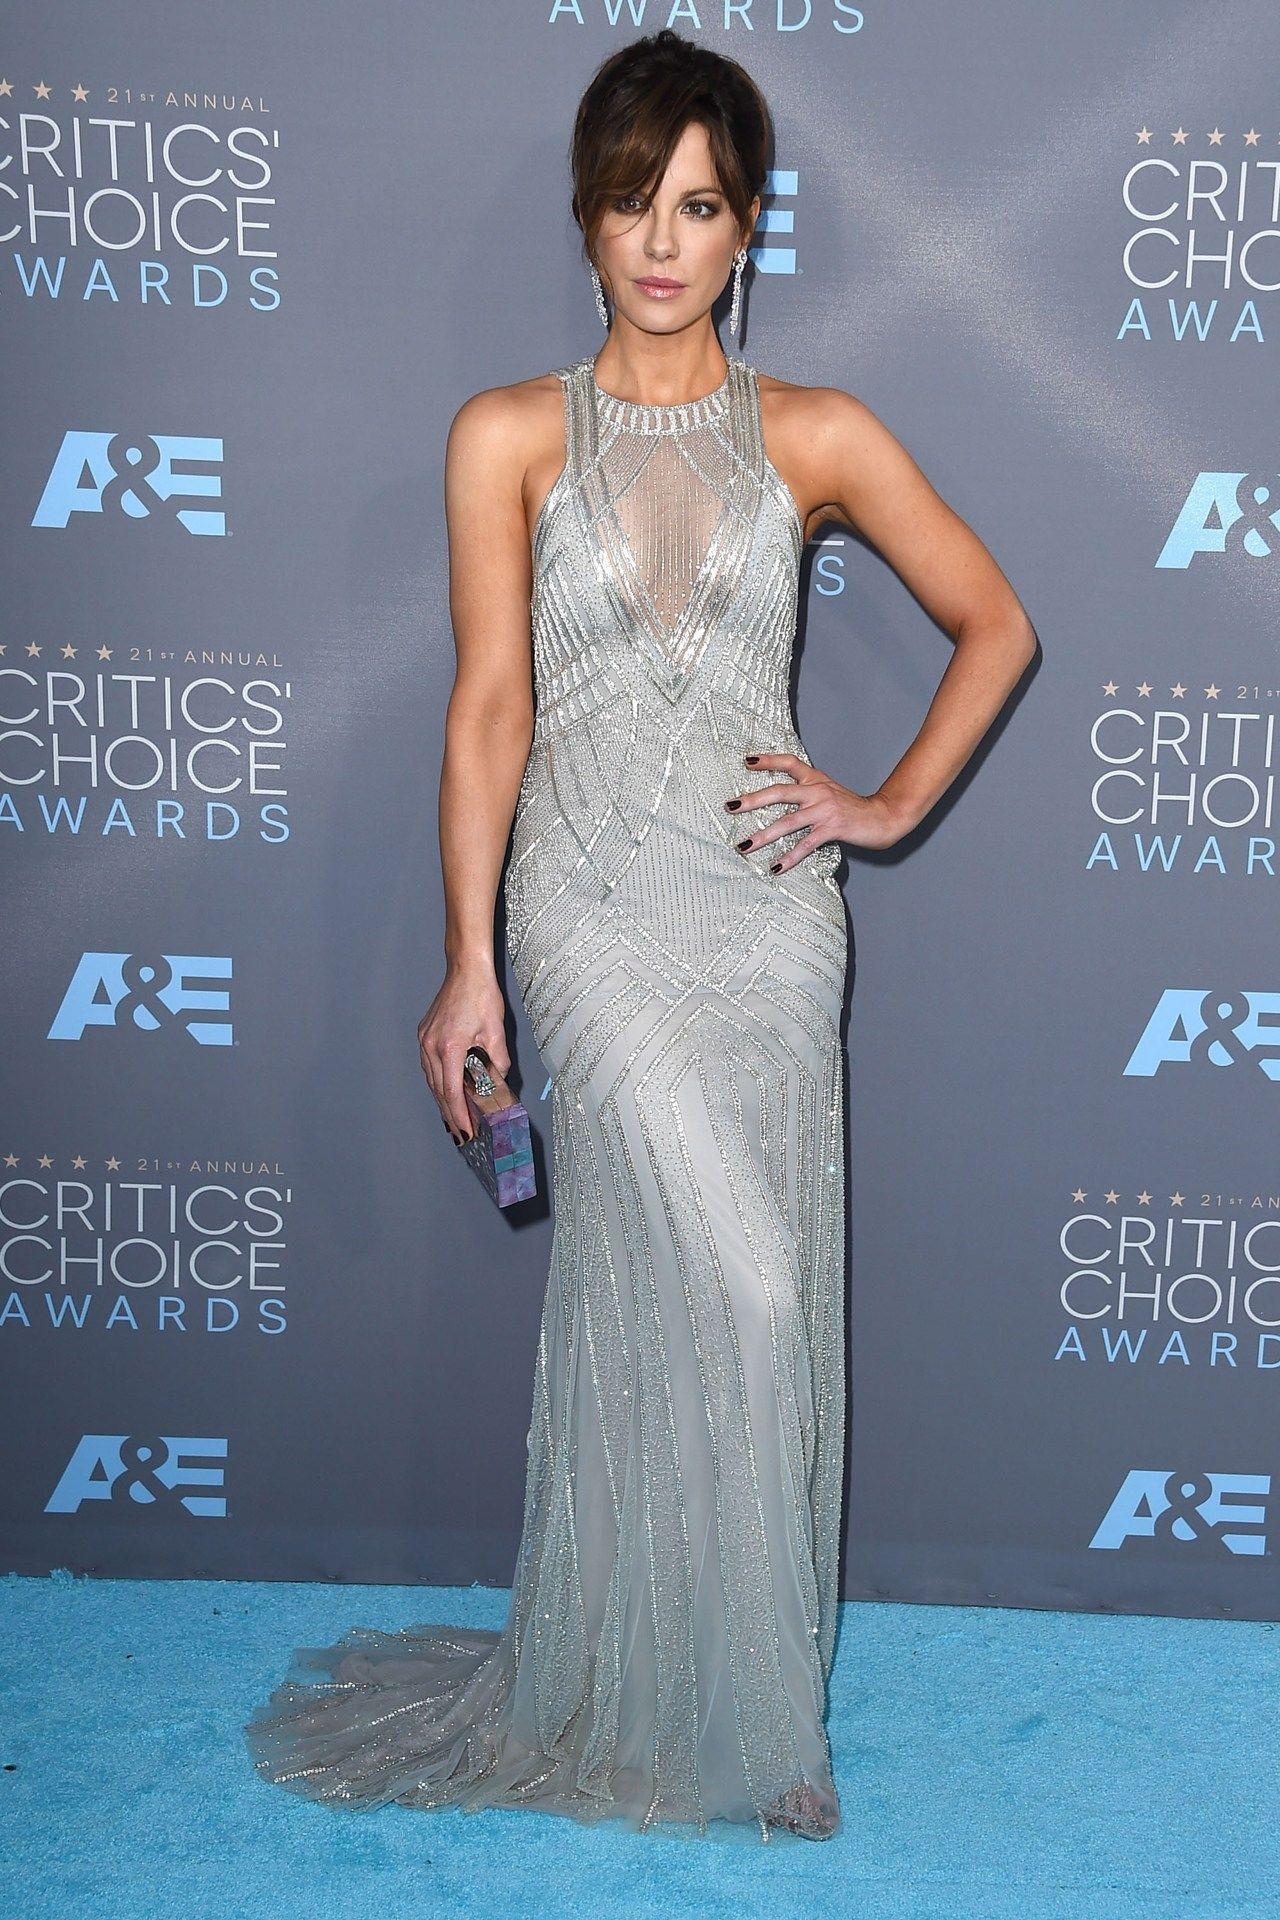 Kate Beckinsale wore a Monique Lhuillier gown with a Kotur clutch.